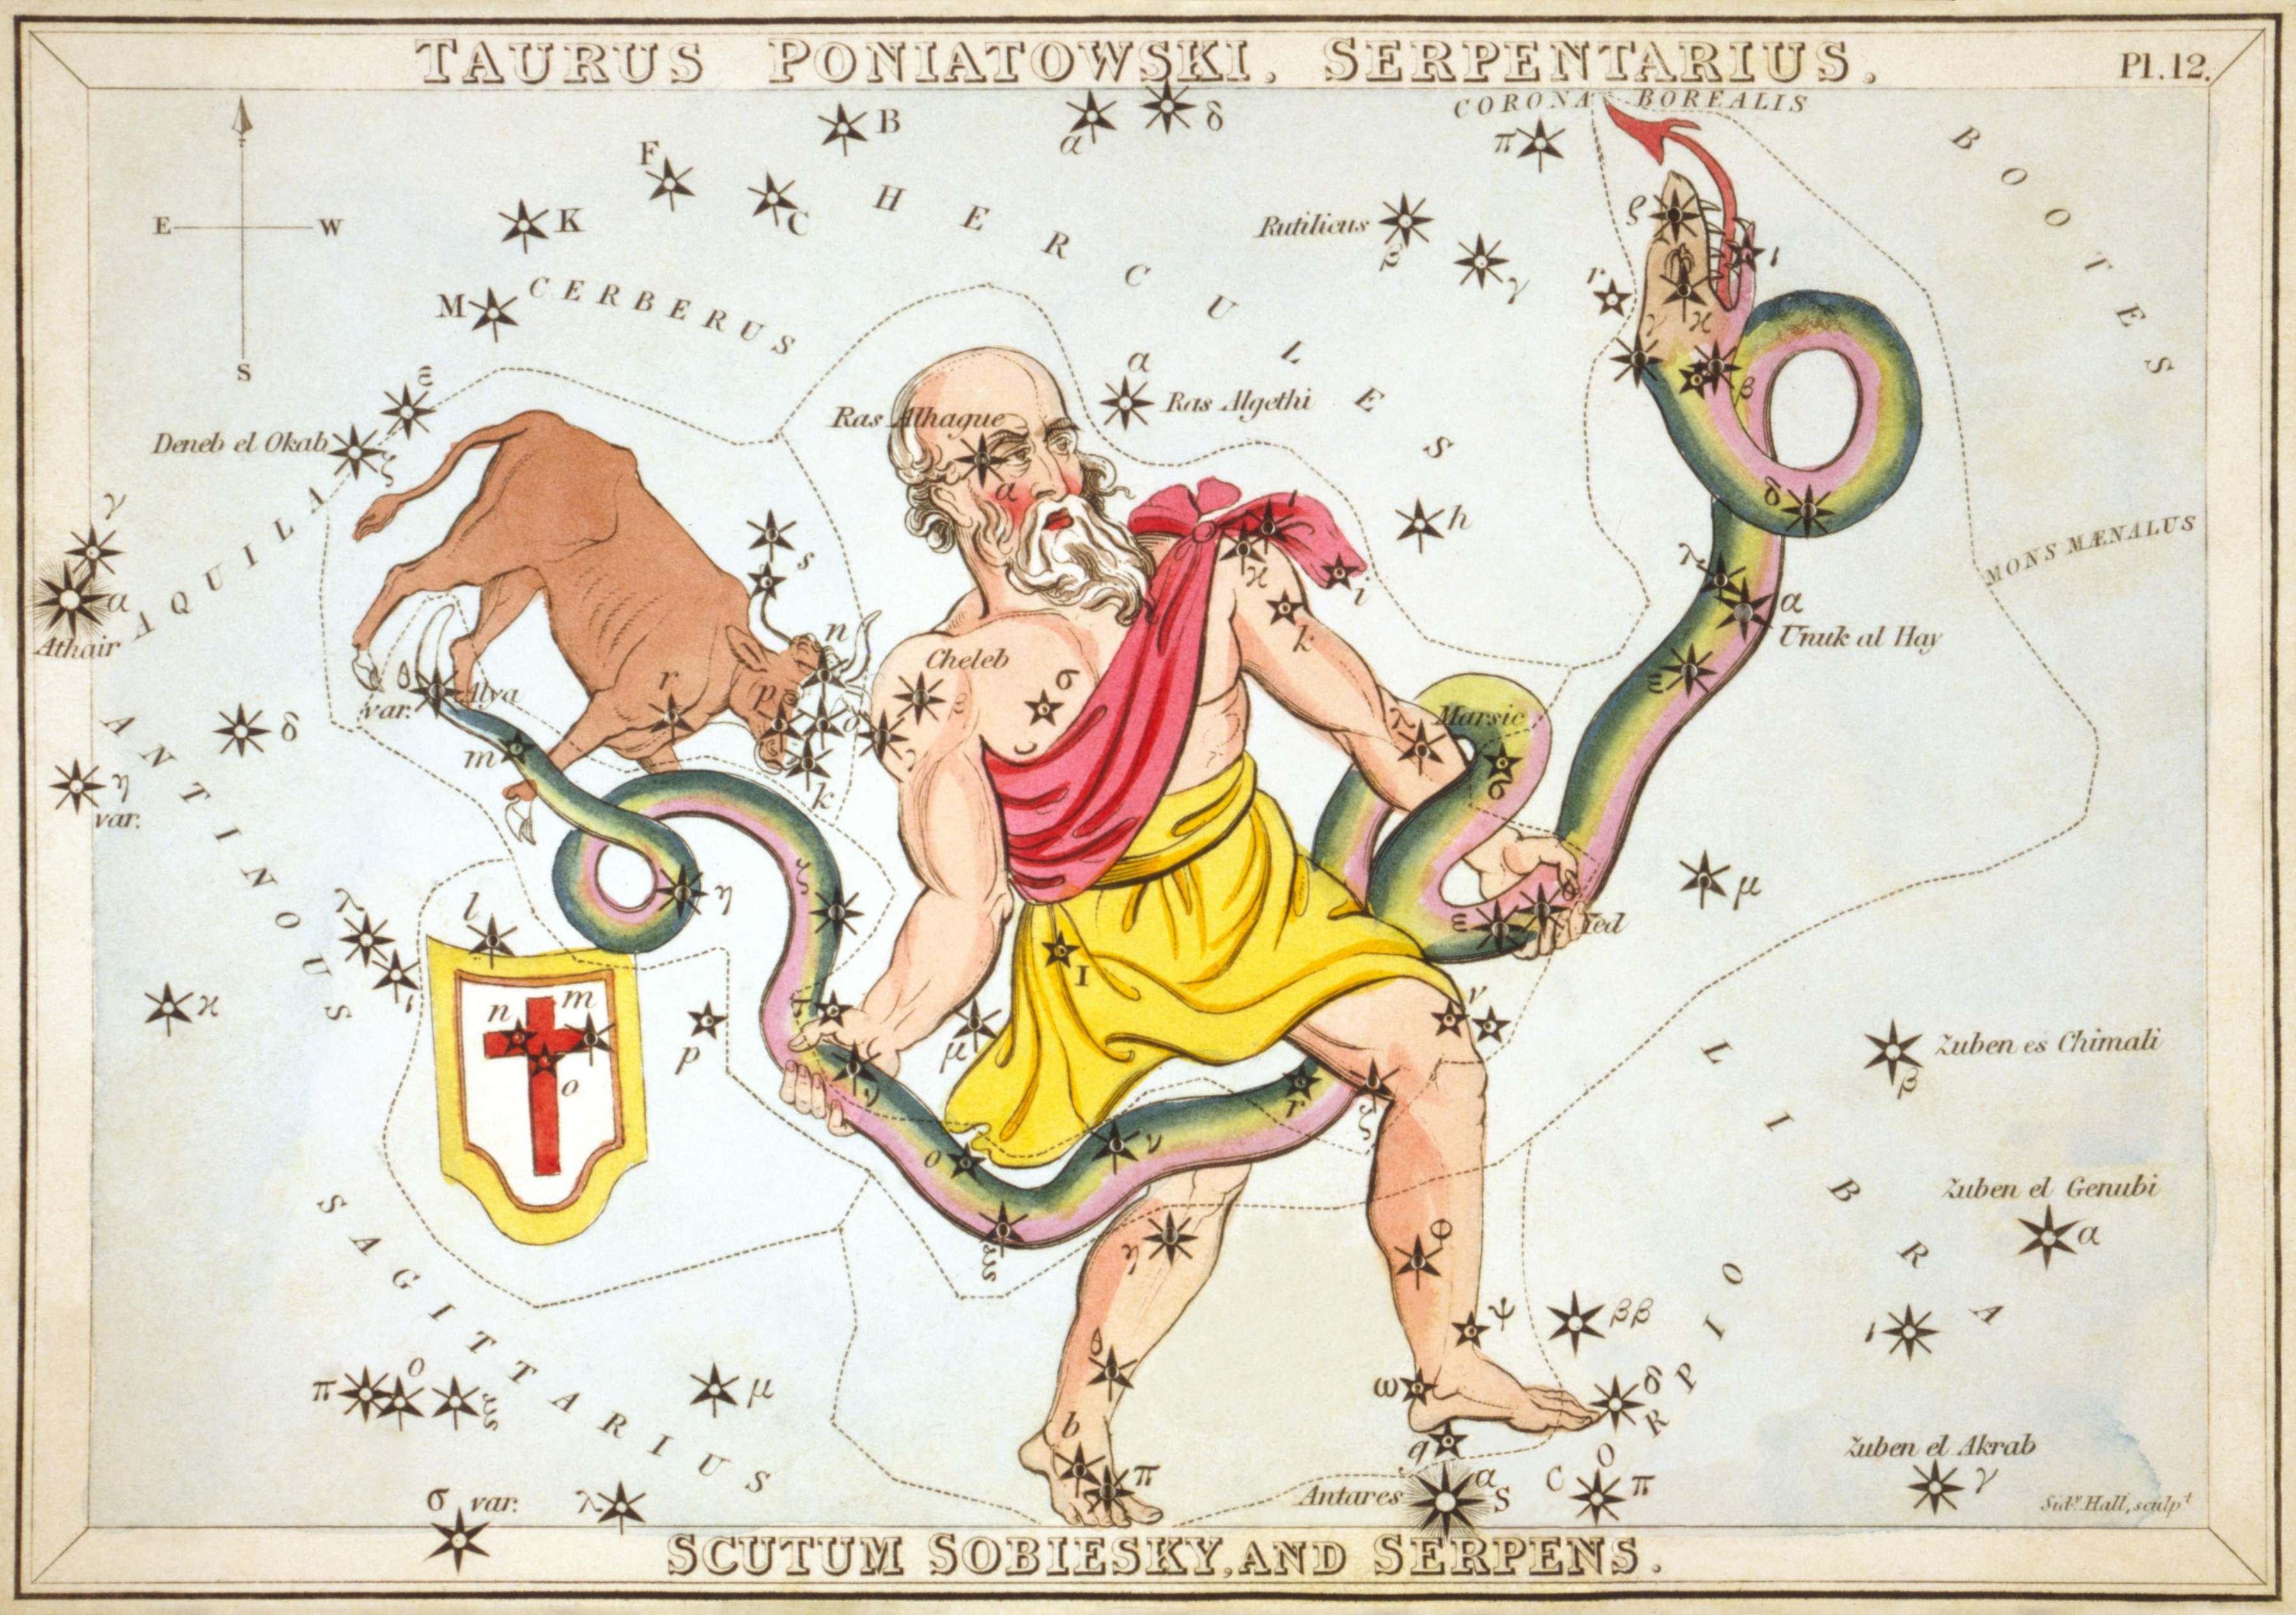 Sidney_Hall_-_Urania's_Mirror_-_Taurus_Poniatowski,_Serpentarius,_Scutum_Sobiesky,_and_Serpens